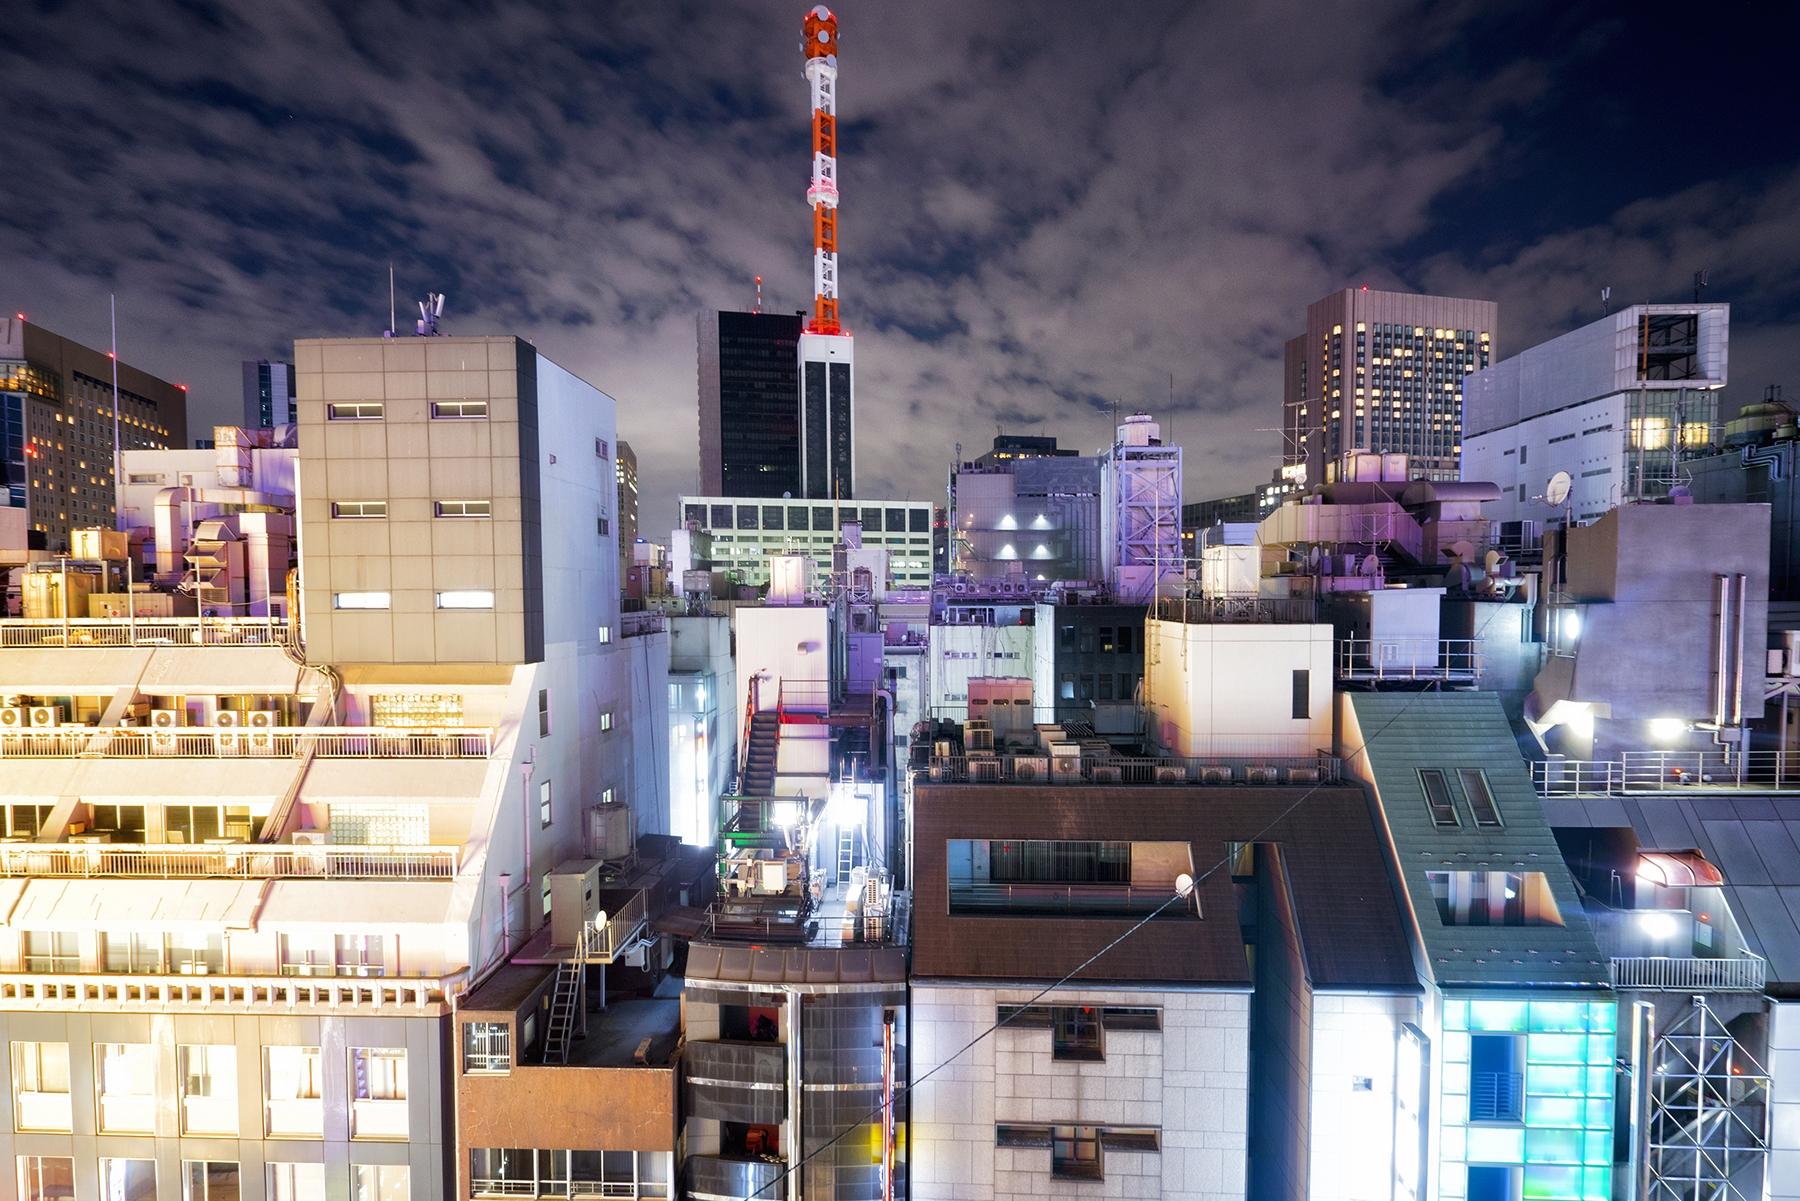 tokyo, shimbashi, ginza, japan, vertigo, rooftop, on top, buildings, night, glow, color, crowded, travel, photo tour, eyexplore,